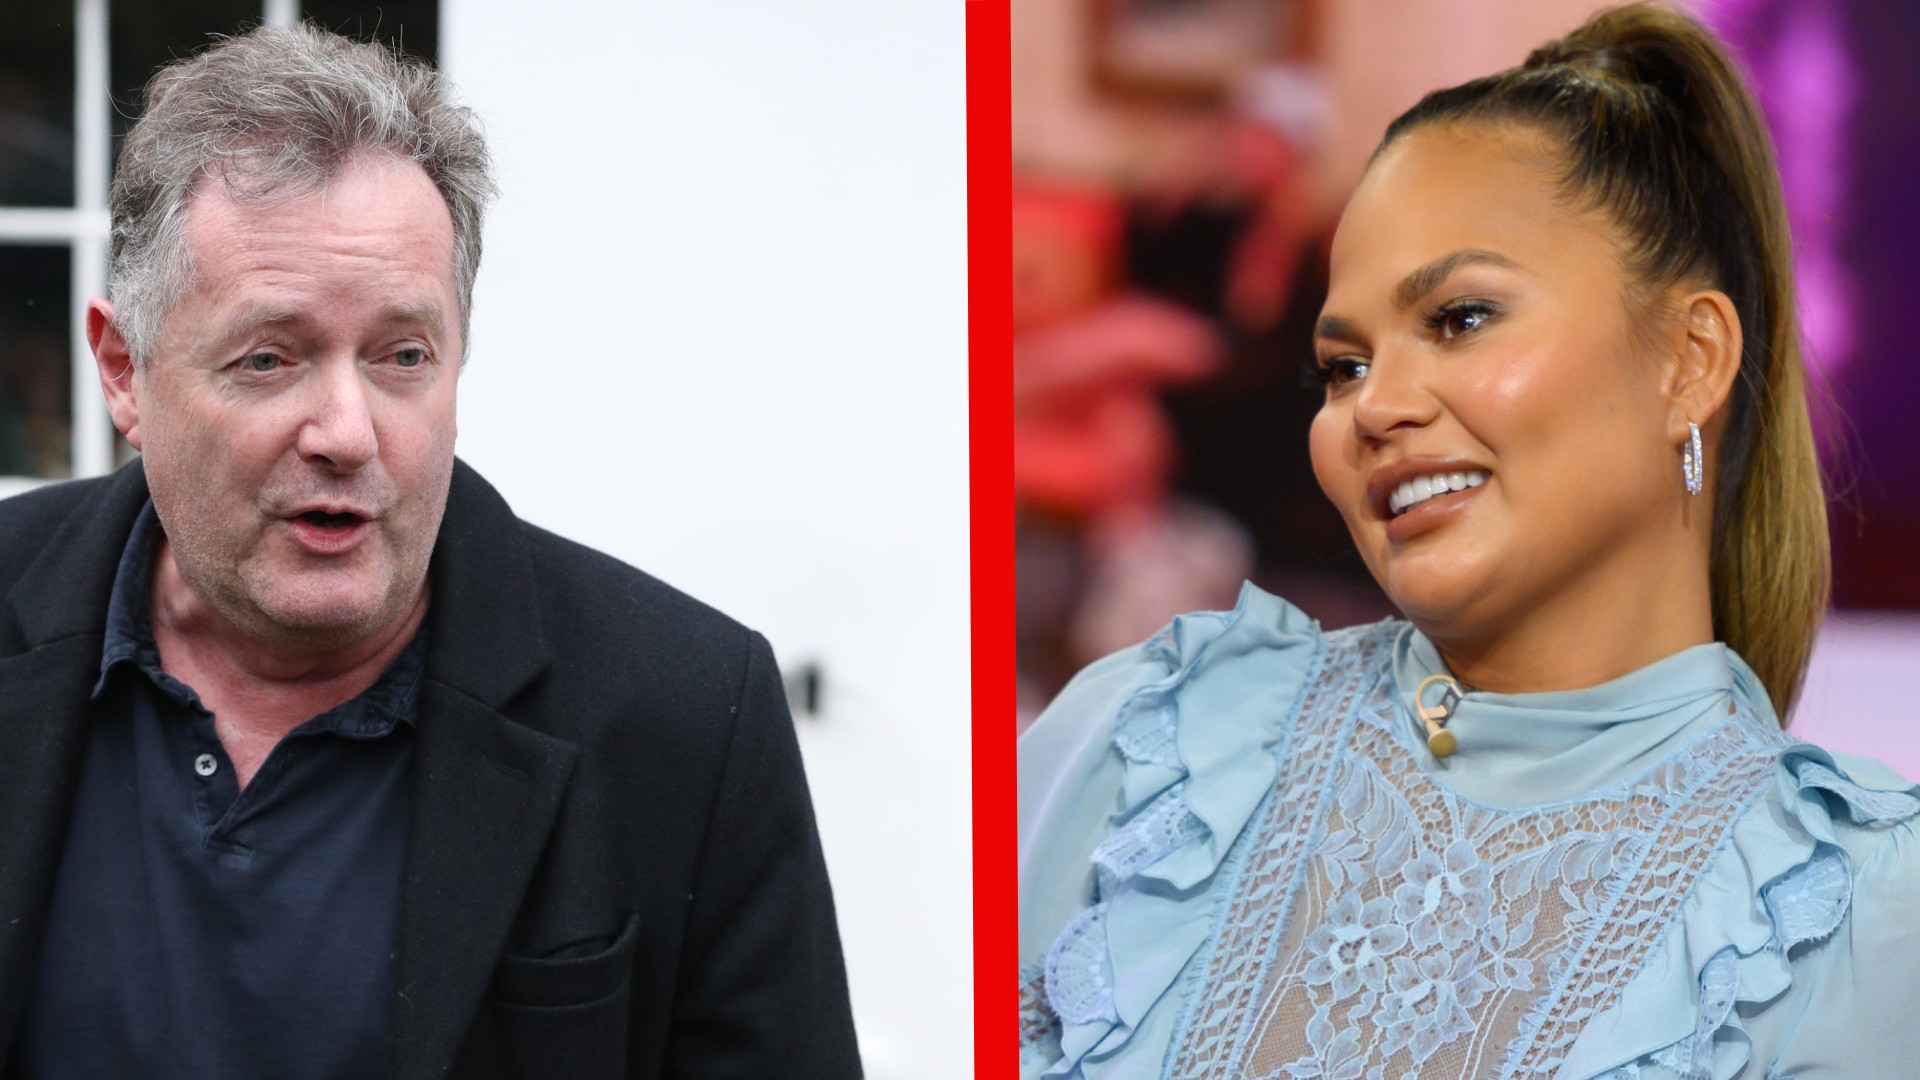 Piers Morgan calls Chrissy Teigen a 'shameless woke celebrity' who 'built a career around being married to a pop star'